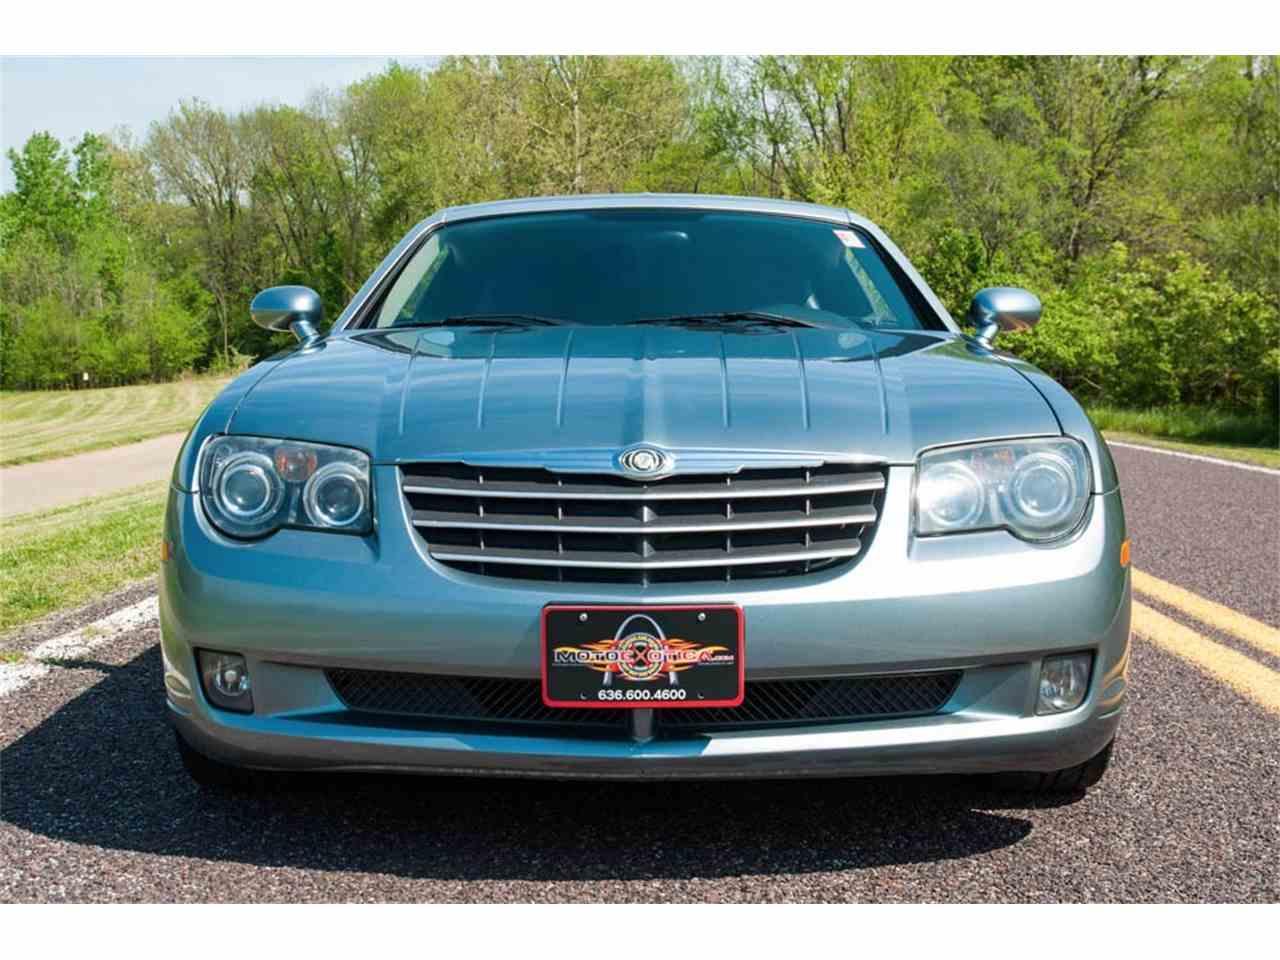 2004 Chrysler Crossfire For Sale Classiccars Com Cc 977519